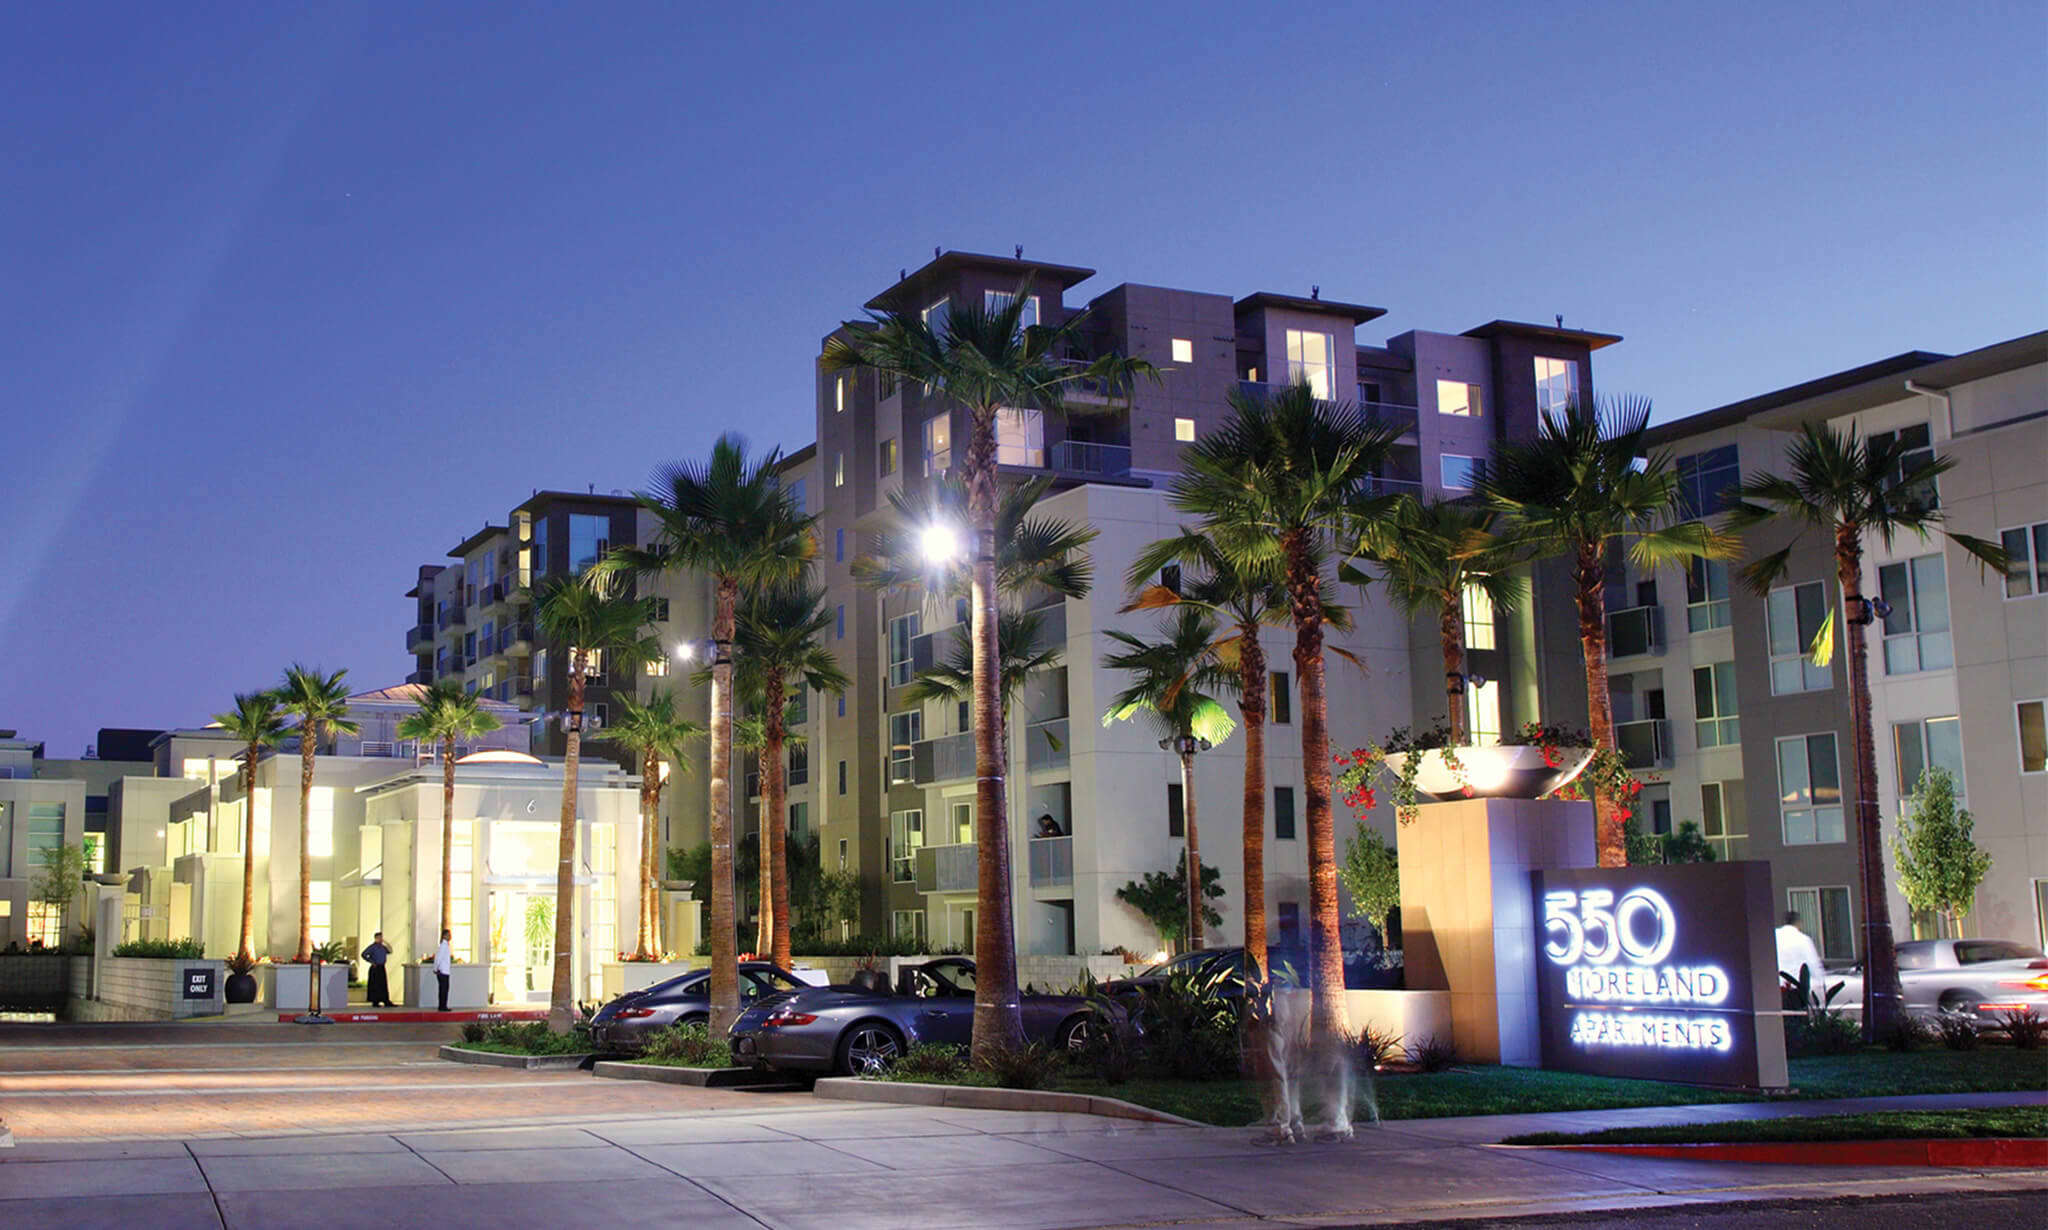 550 Moreland Apartments apartments in Santa Clara CA to rent photo 3